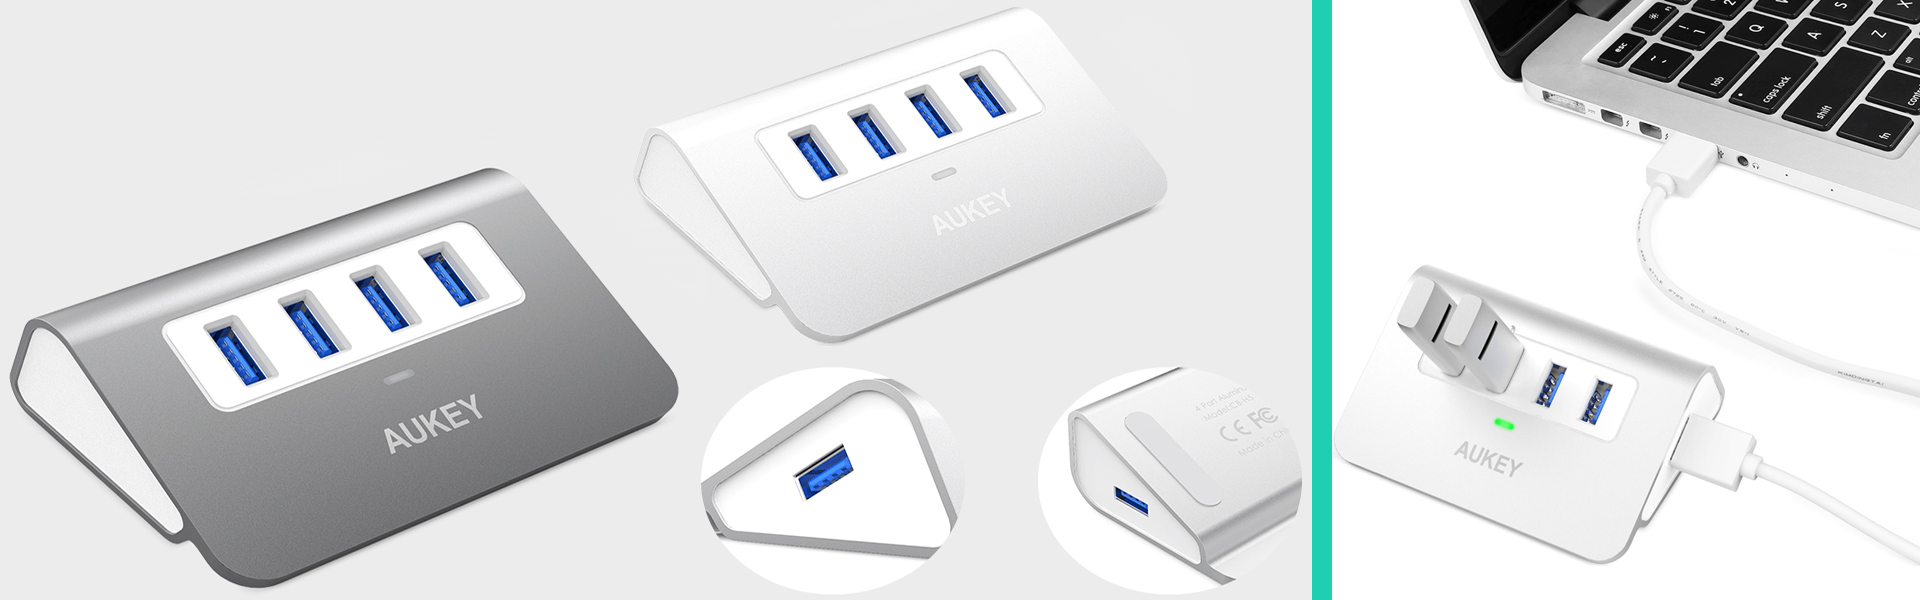 USB 3.0 Hubs